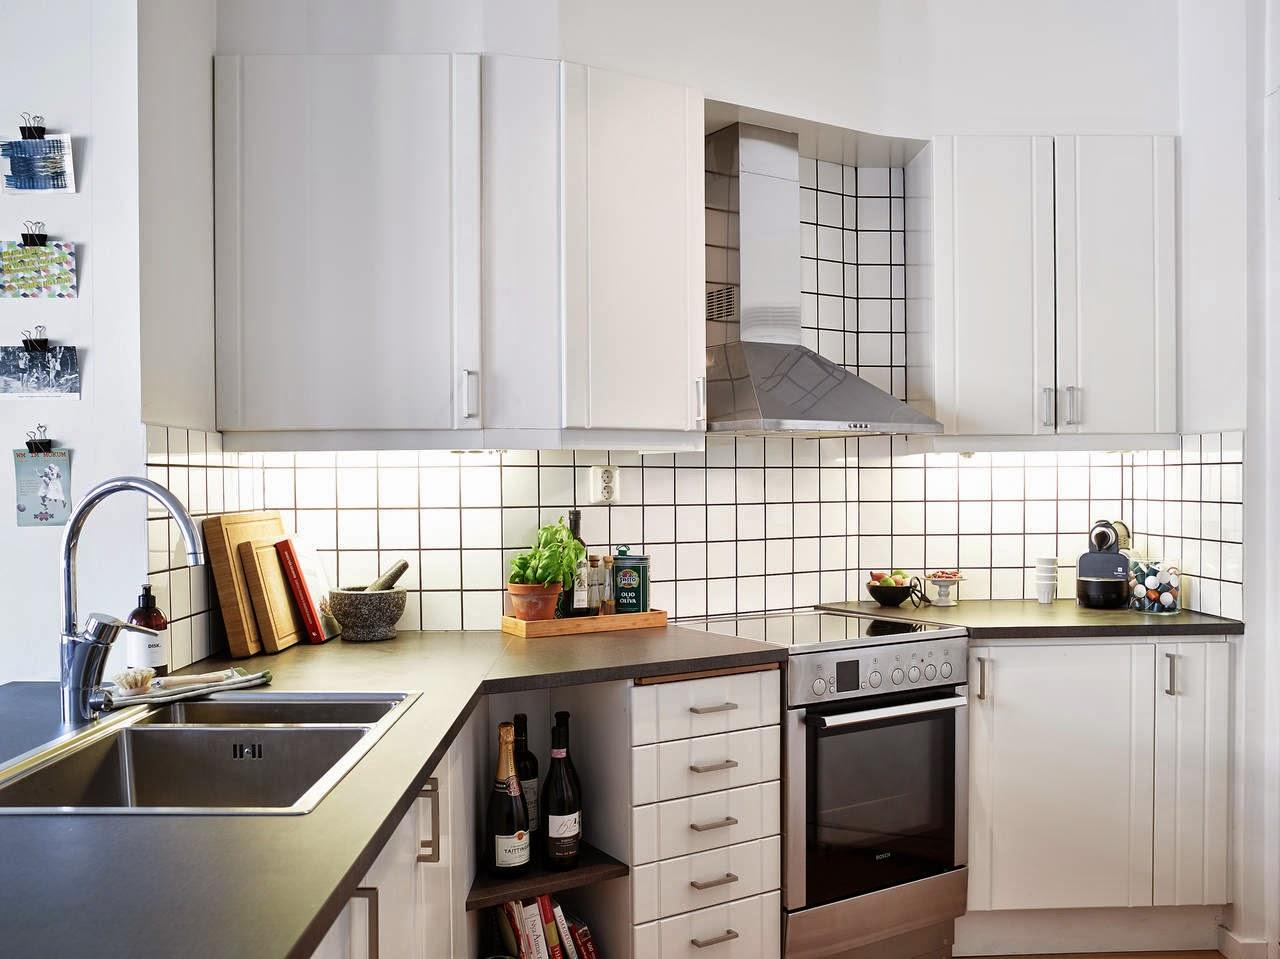 inspiracion-deco-piso-nordico-blanco-negro-low-cost